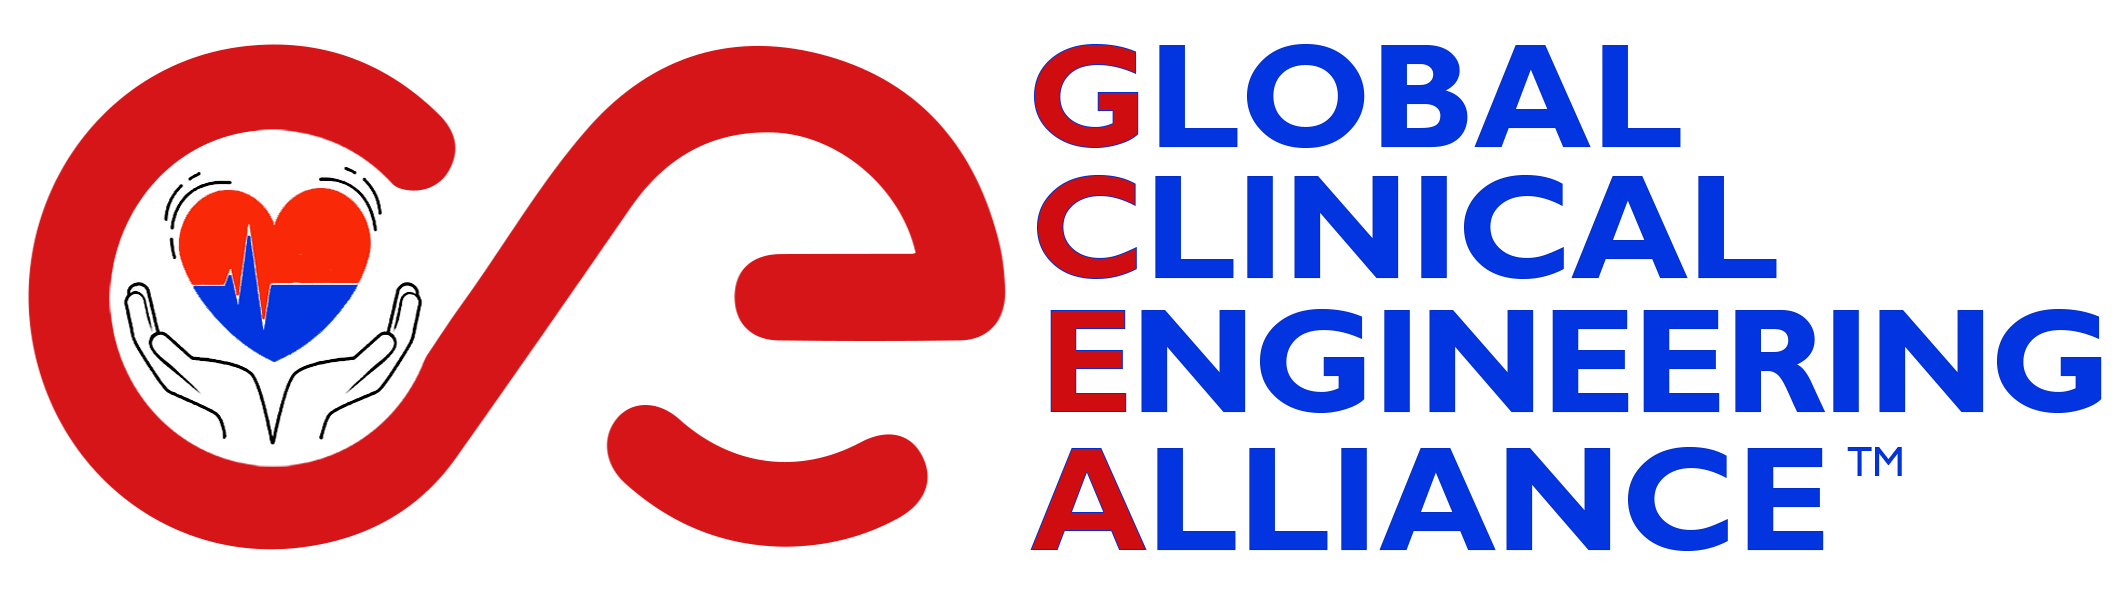 Global CE Alliance logov7-2